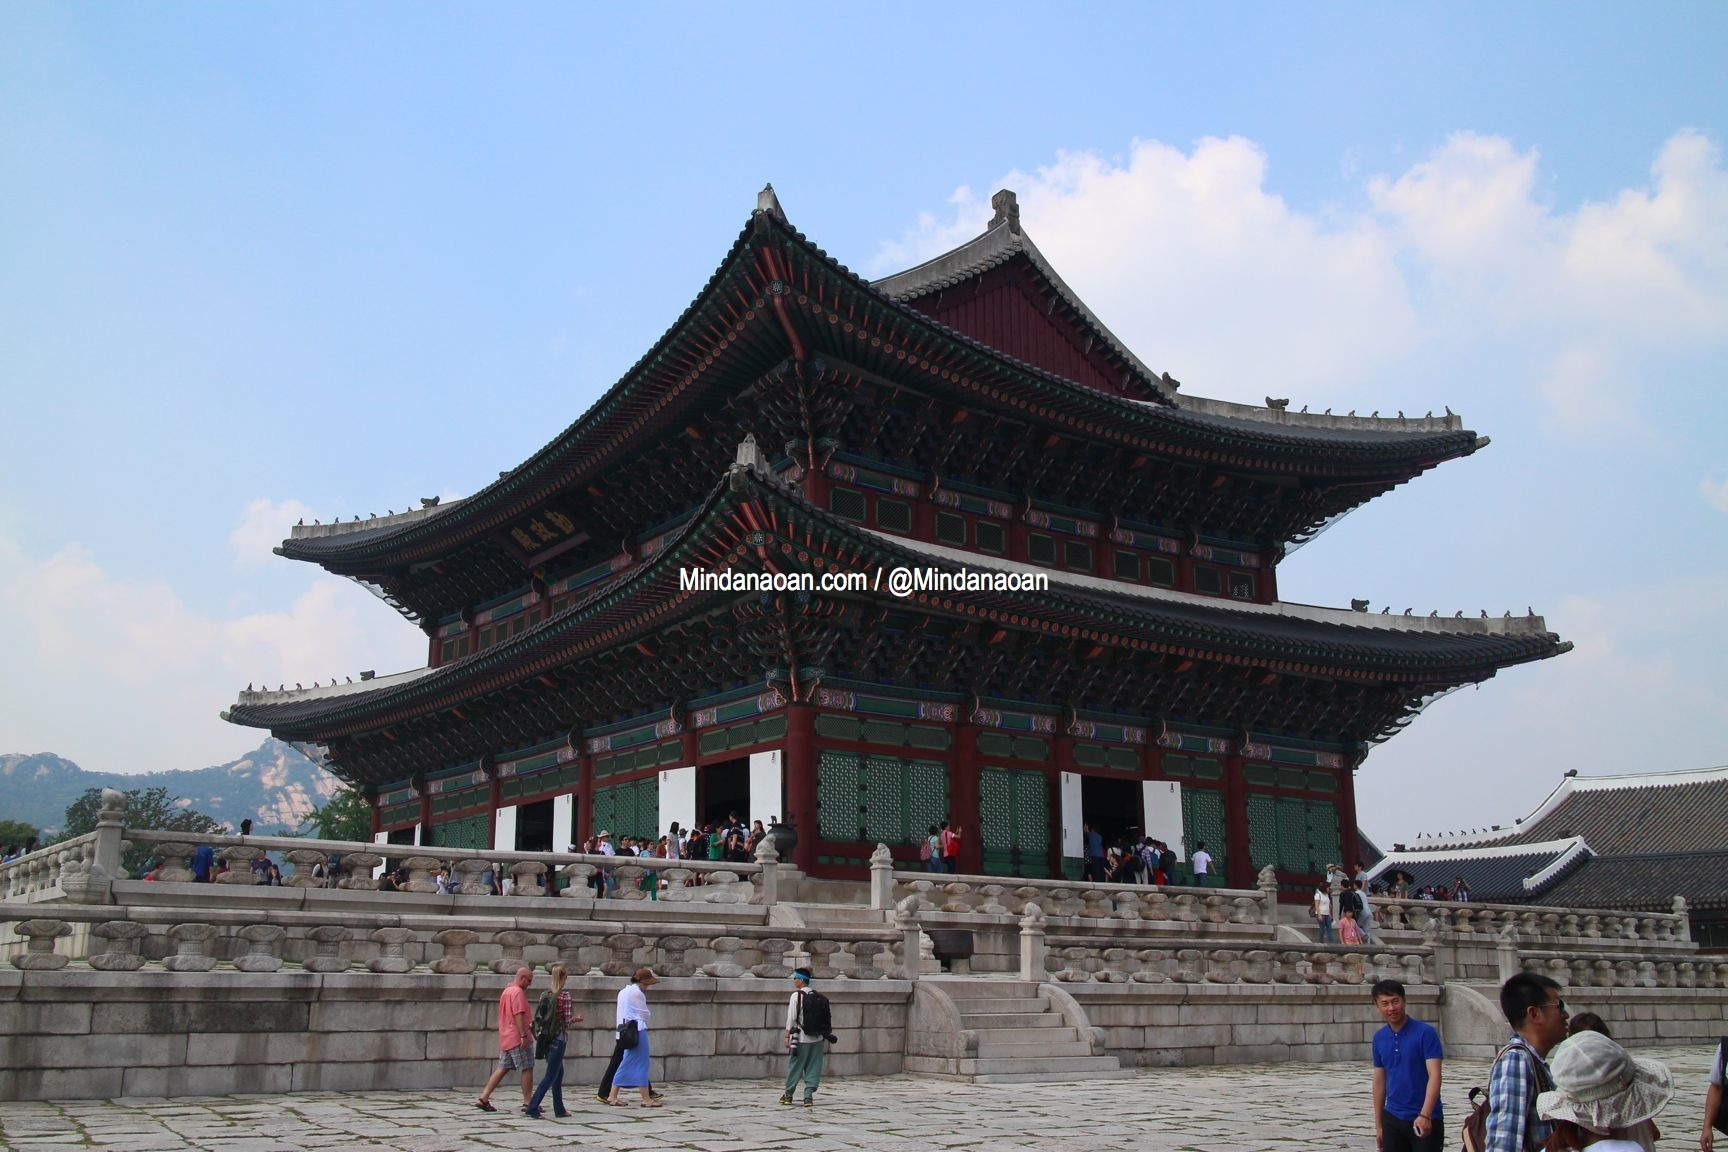 seoul-koreaI-gyeokbukgung-palace